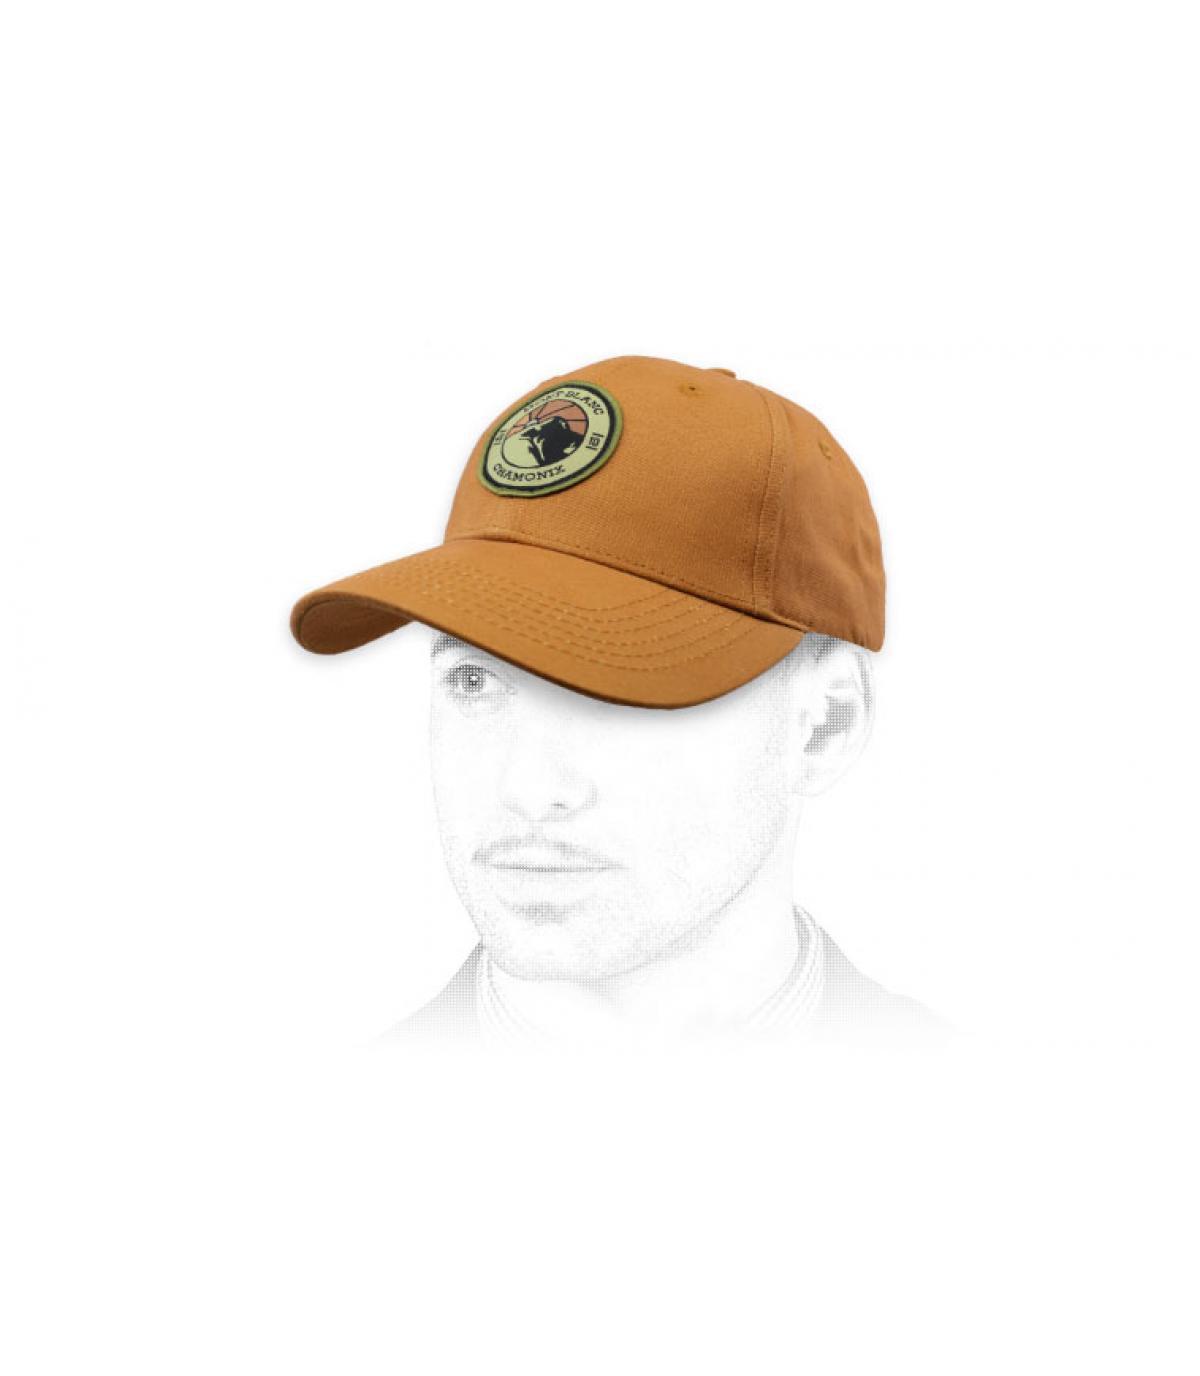 Cappellino beige del Monte Bianco